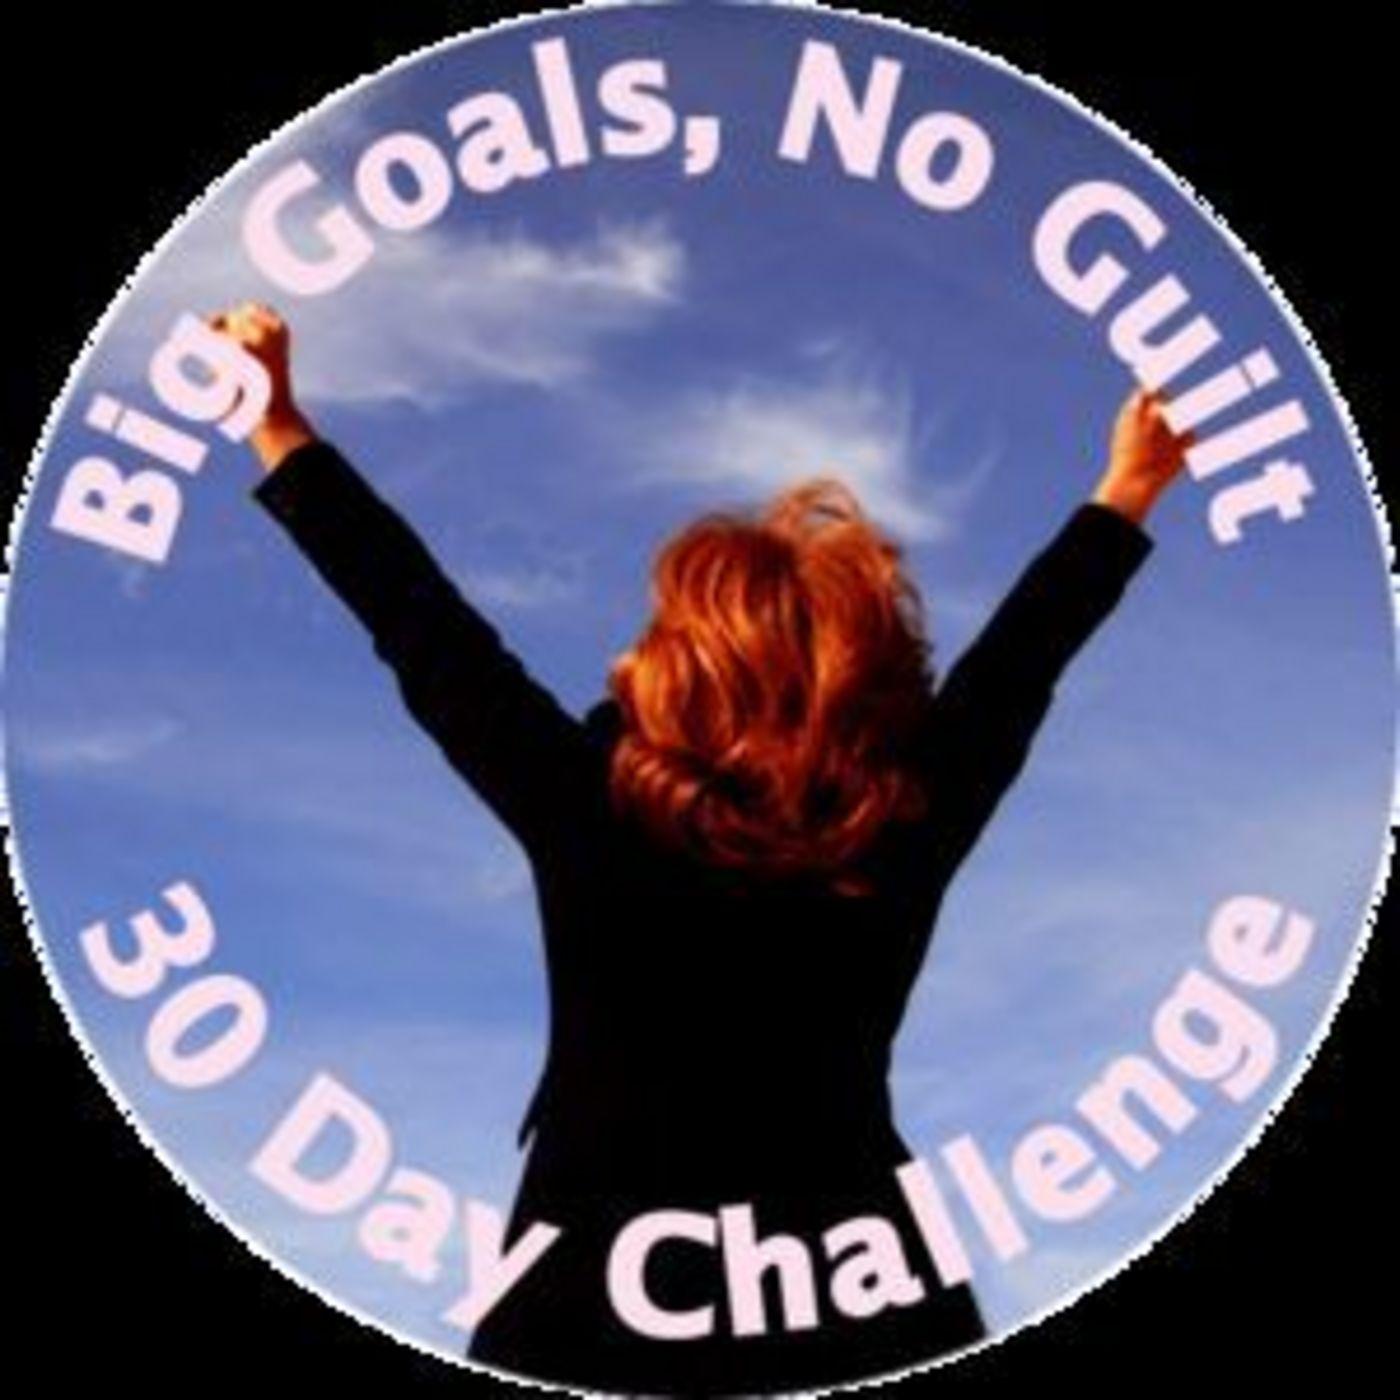 Big Goals No Guilt 30 Day Challenge